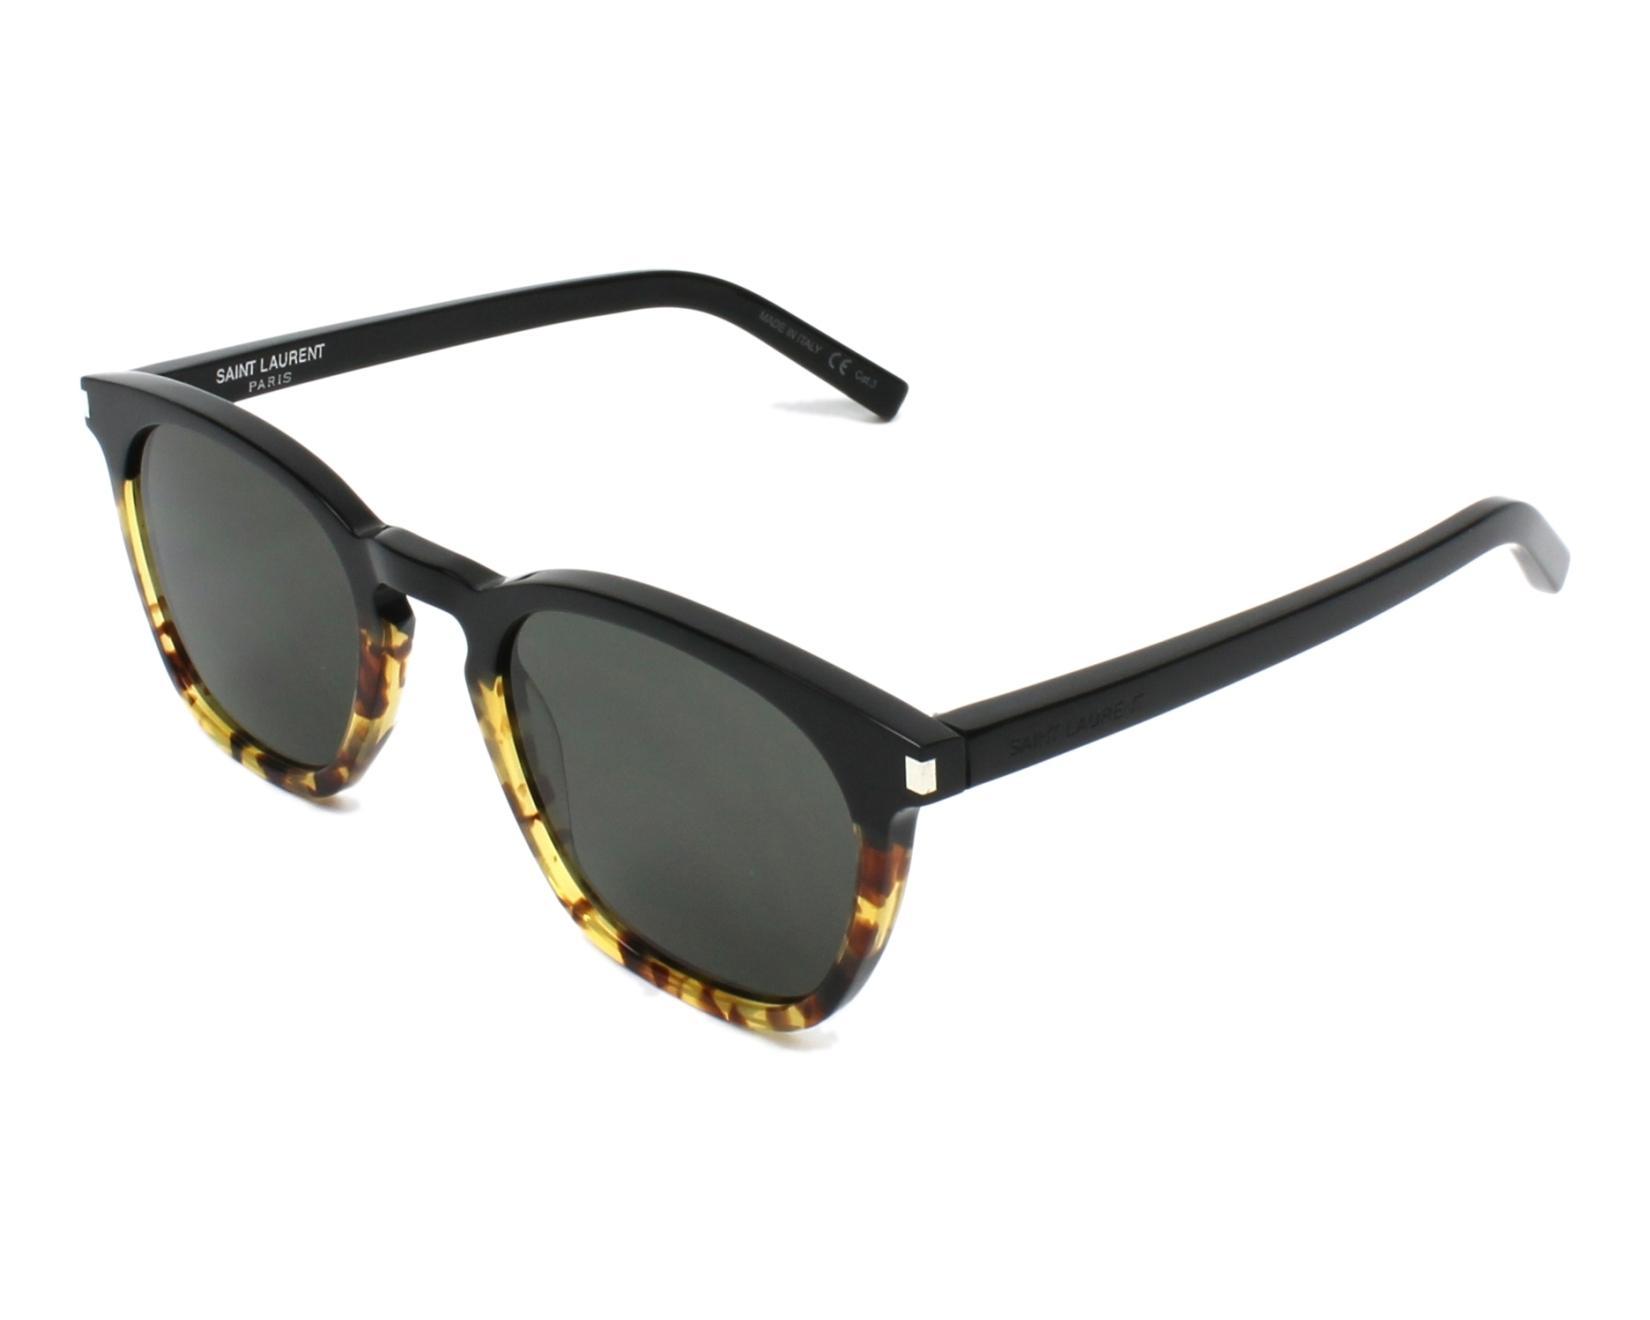 af05b125db2 Sunglasses Yves Saint Laurent SL-28 024 51-23 Black Havana profile view